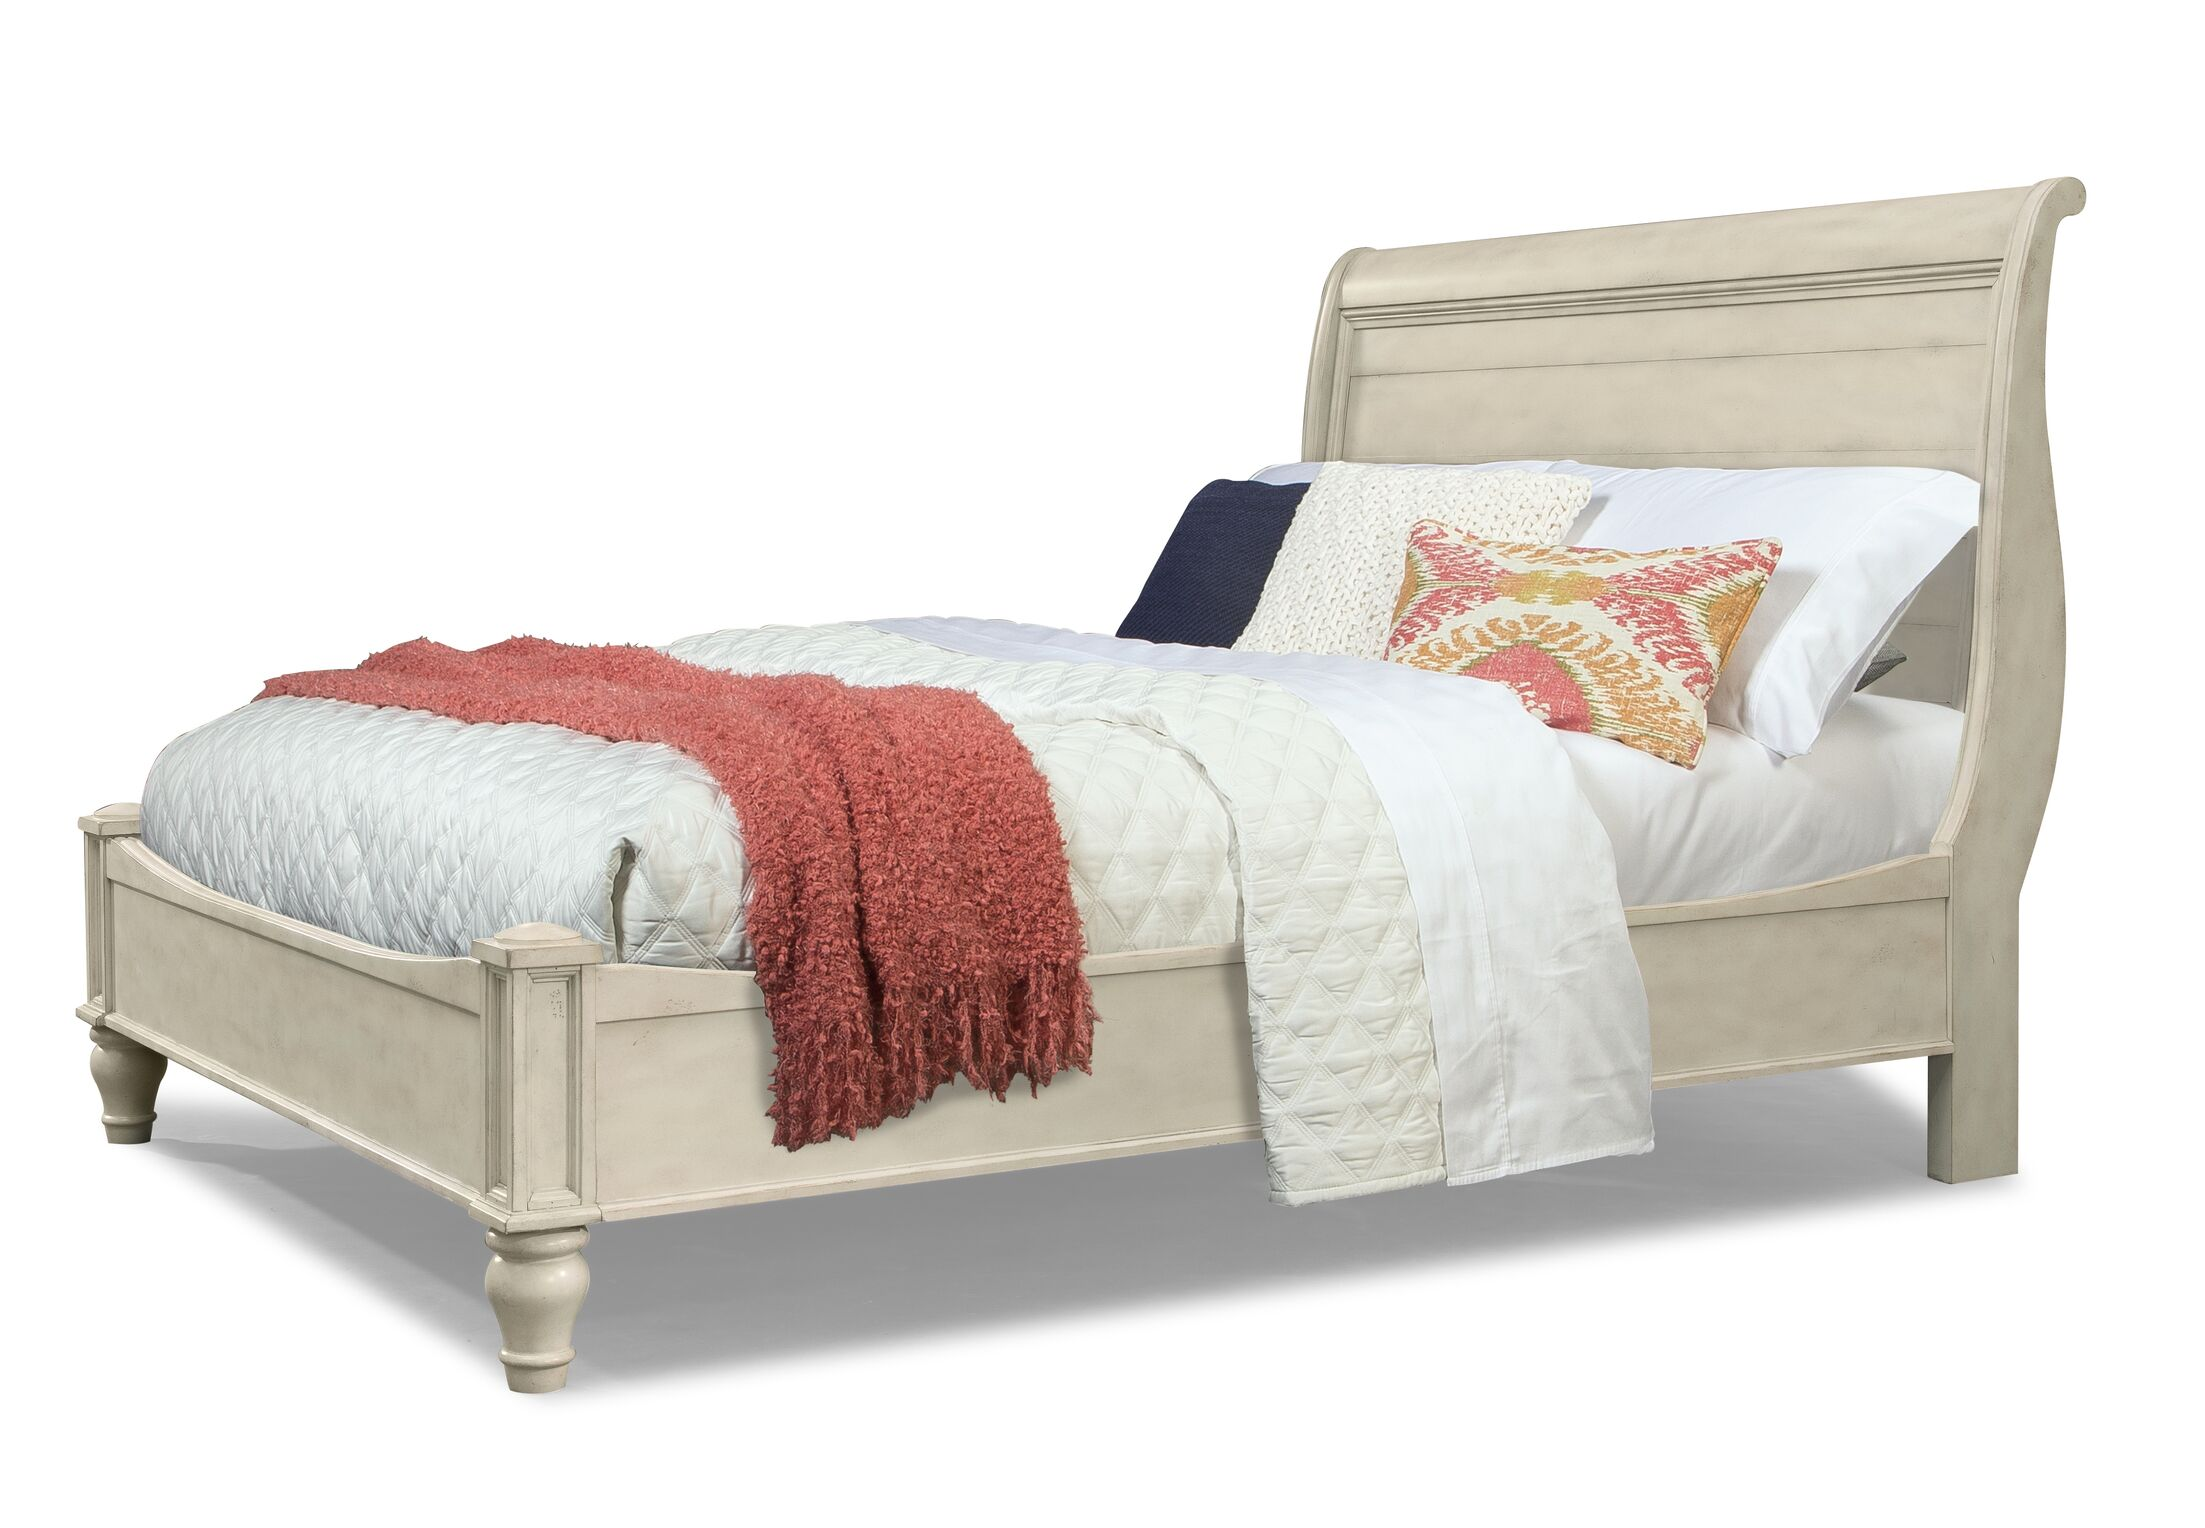 Allgood Wood Frame Sleigh Bed